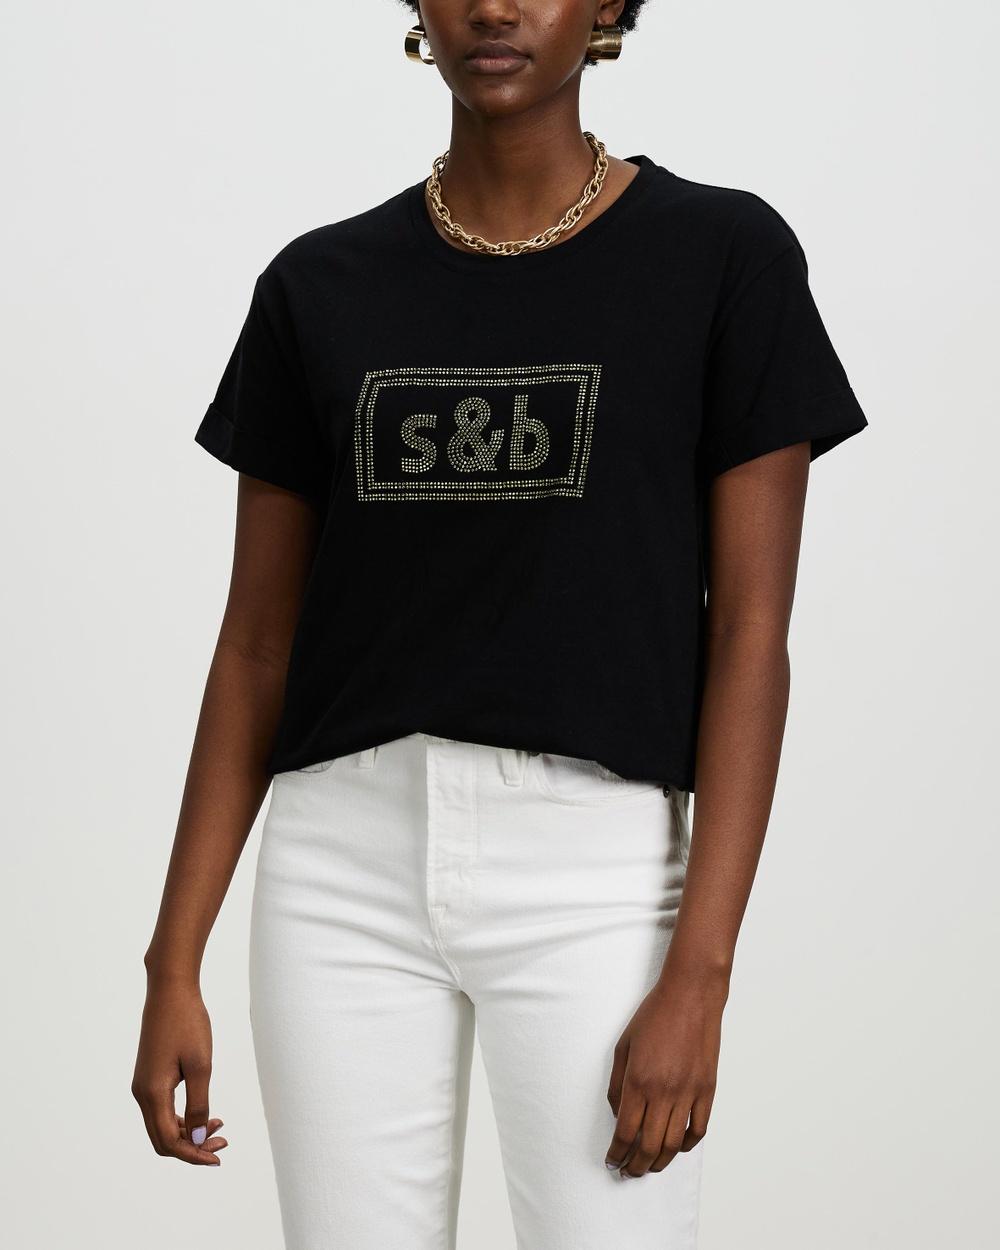 Sass & Bide The New Brave Tee T-Shirts Singlets Black